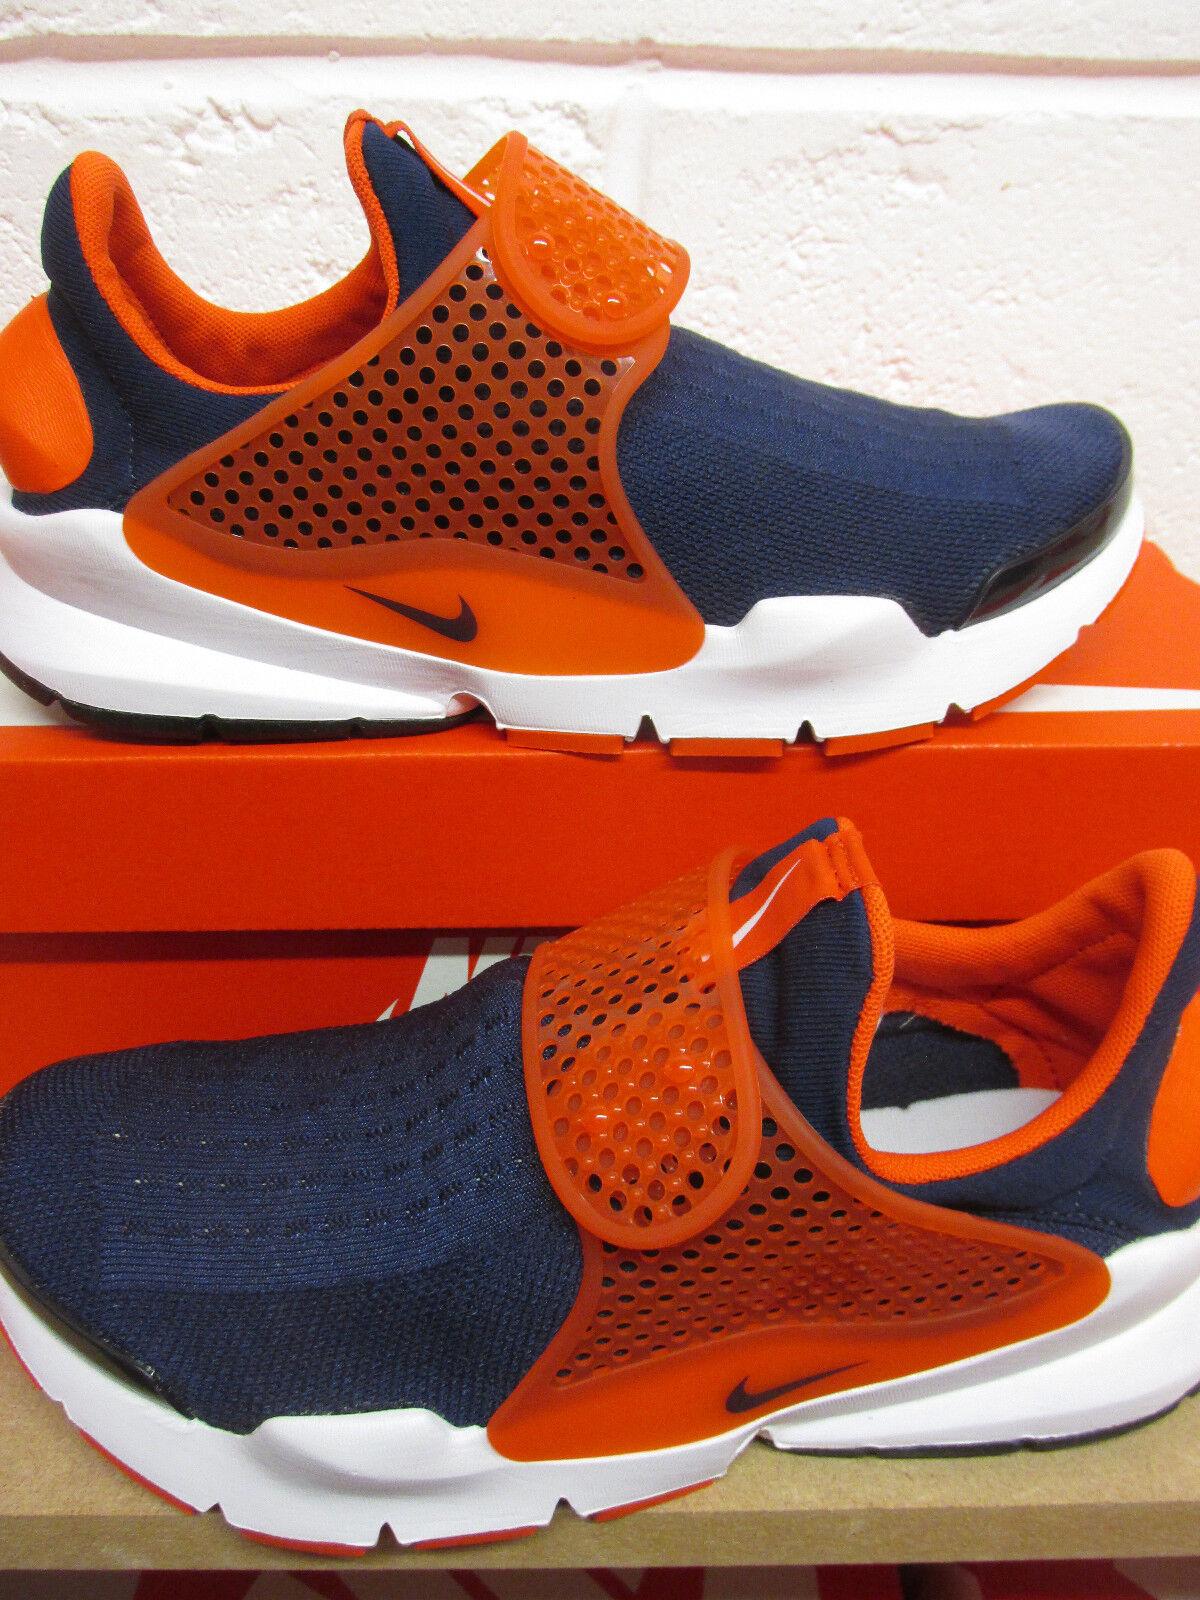 Nike Sock Dart Mens Running Trainers 819686 402 Sneakers shoes